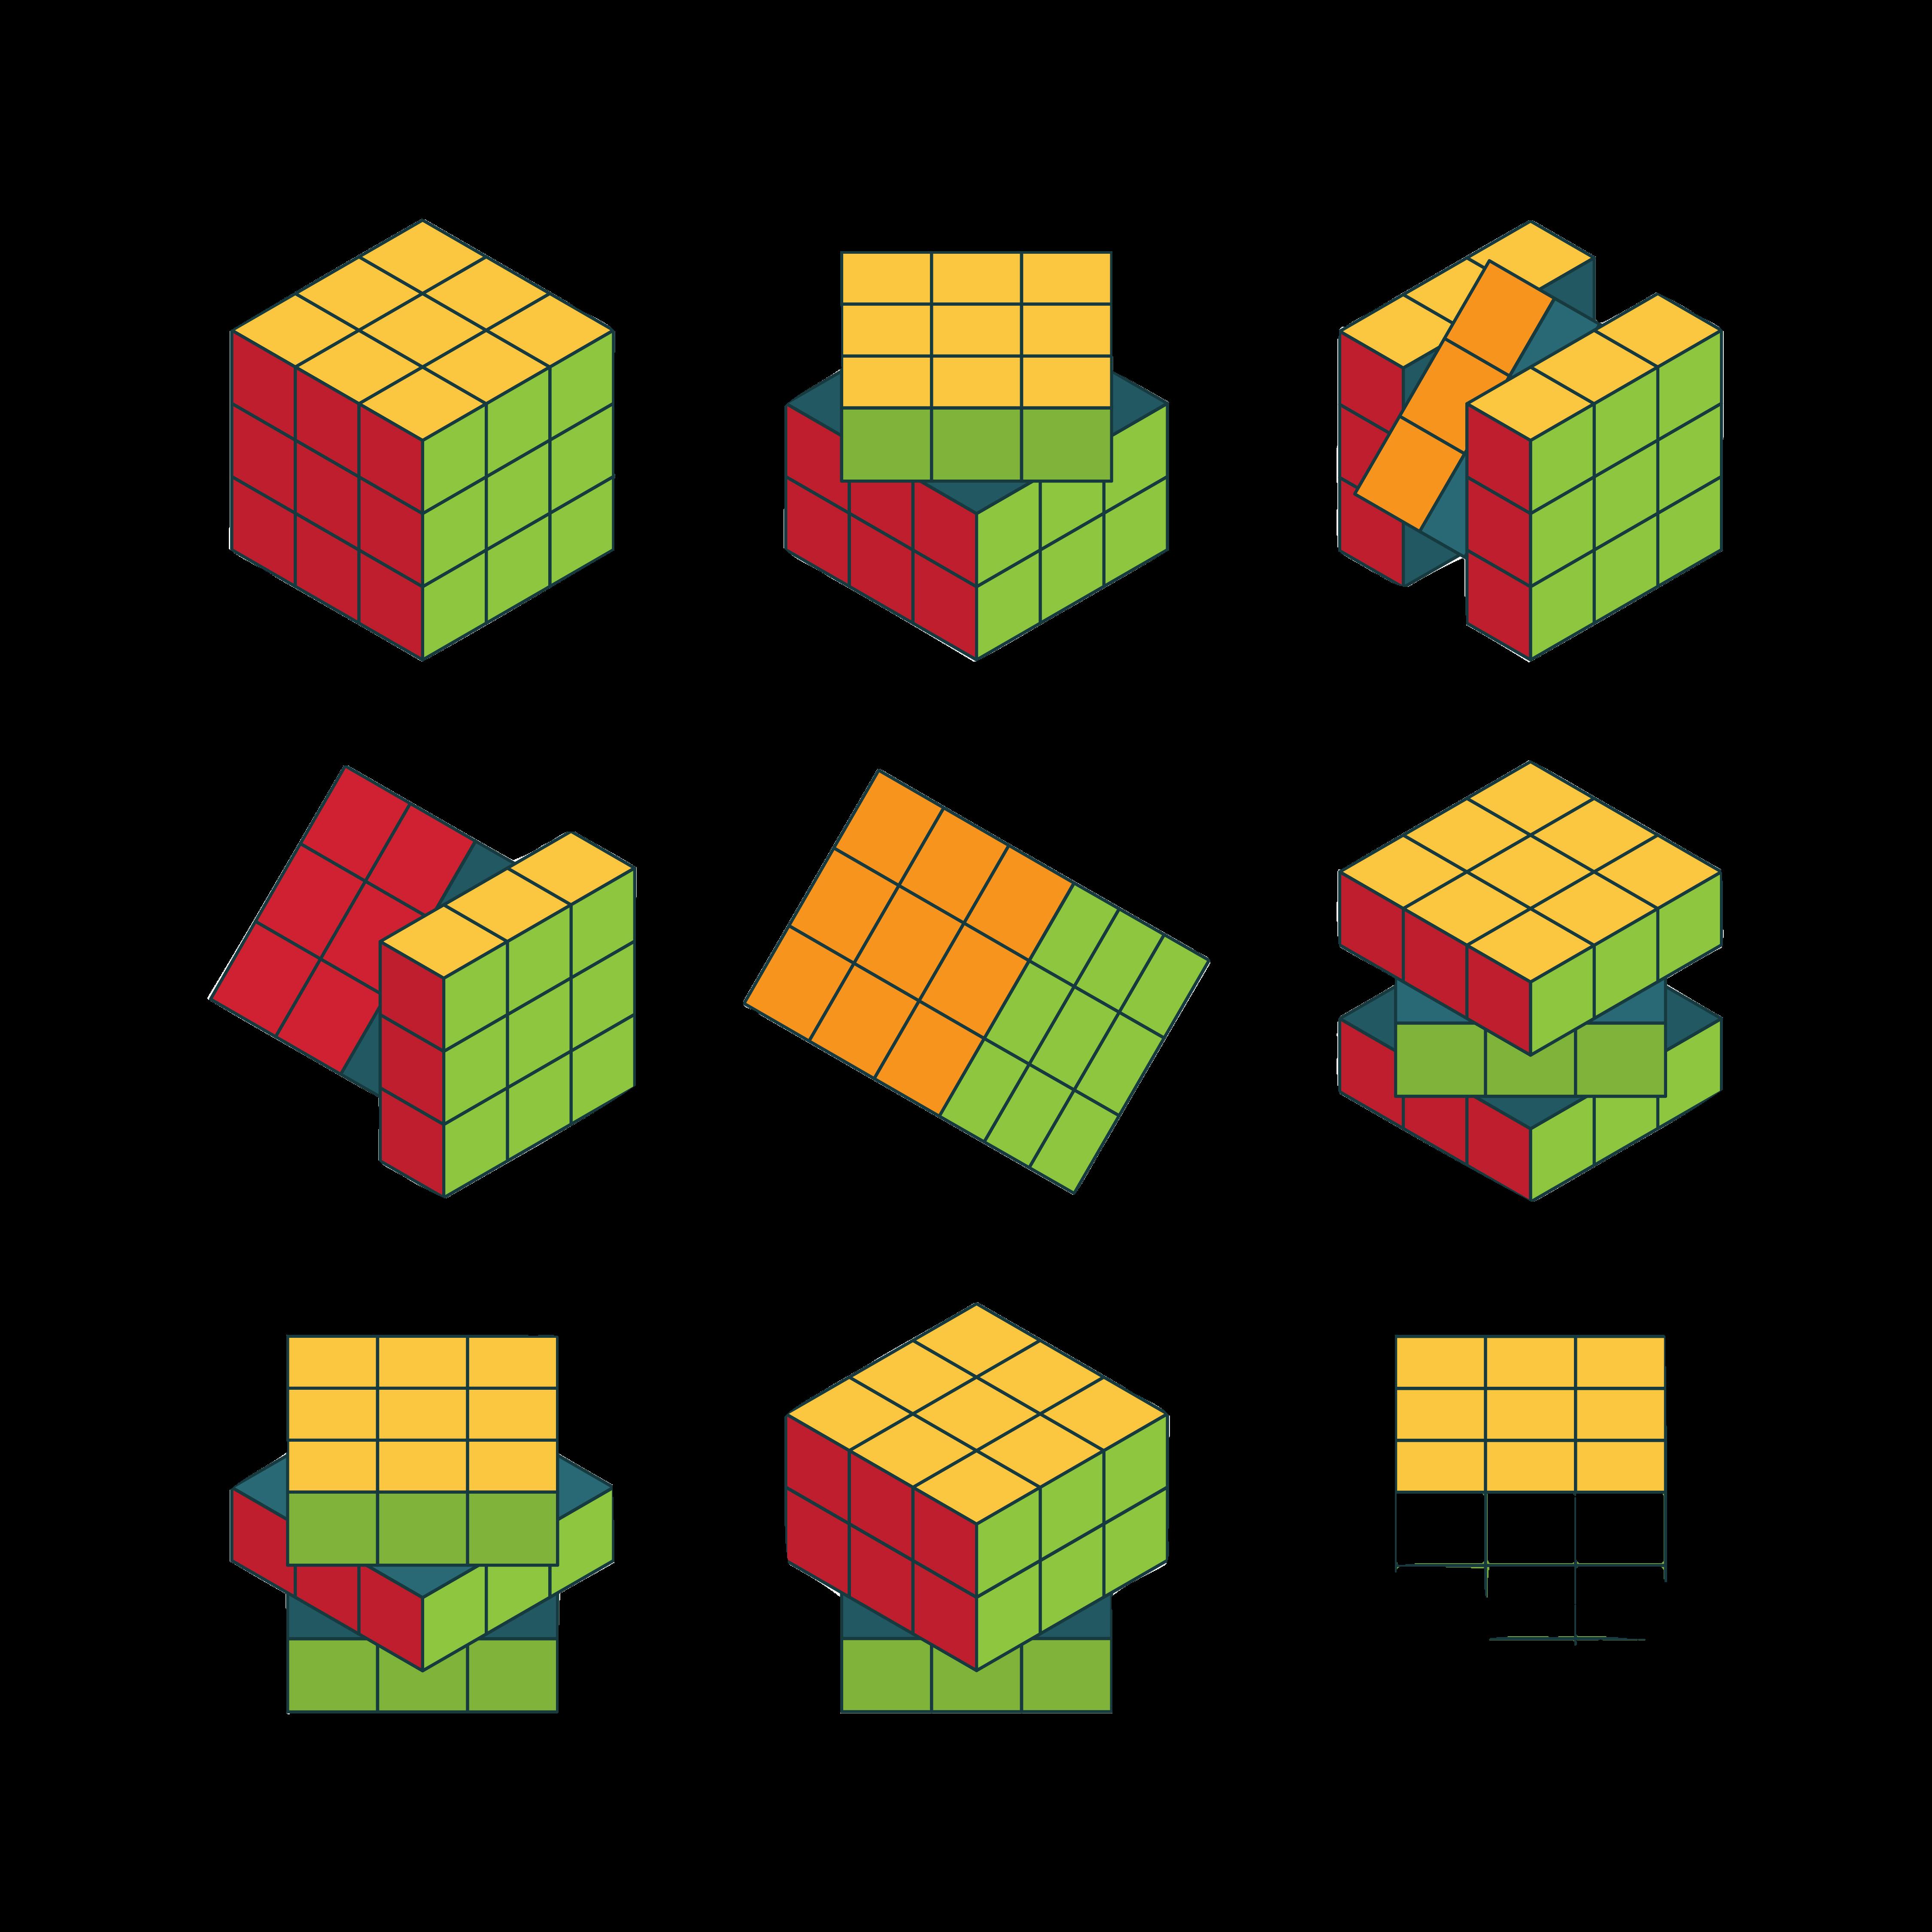 Speedcubing: Solving Rubik's Cube